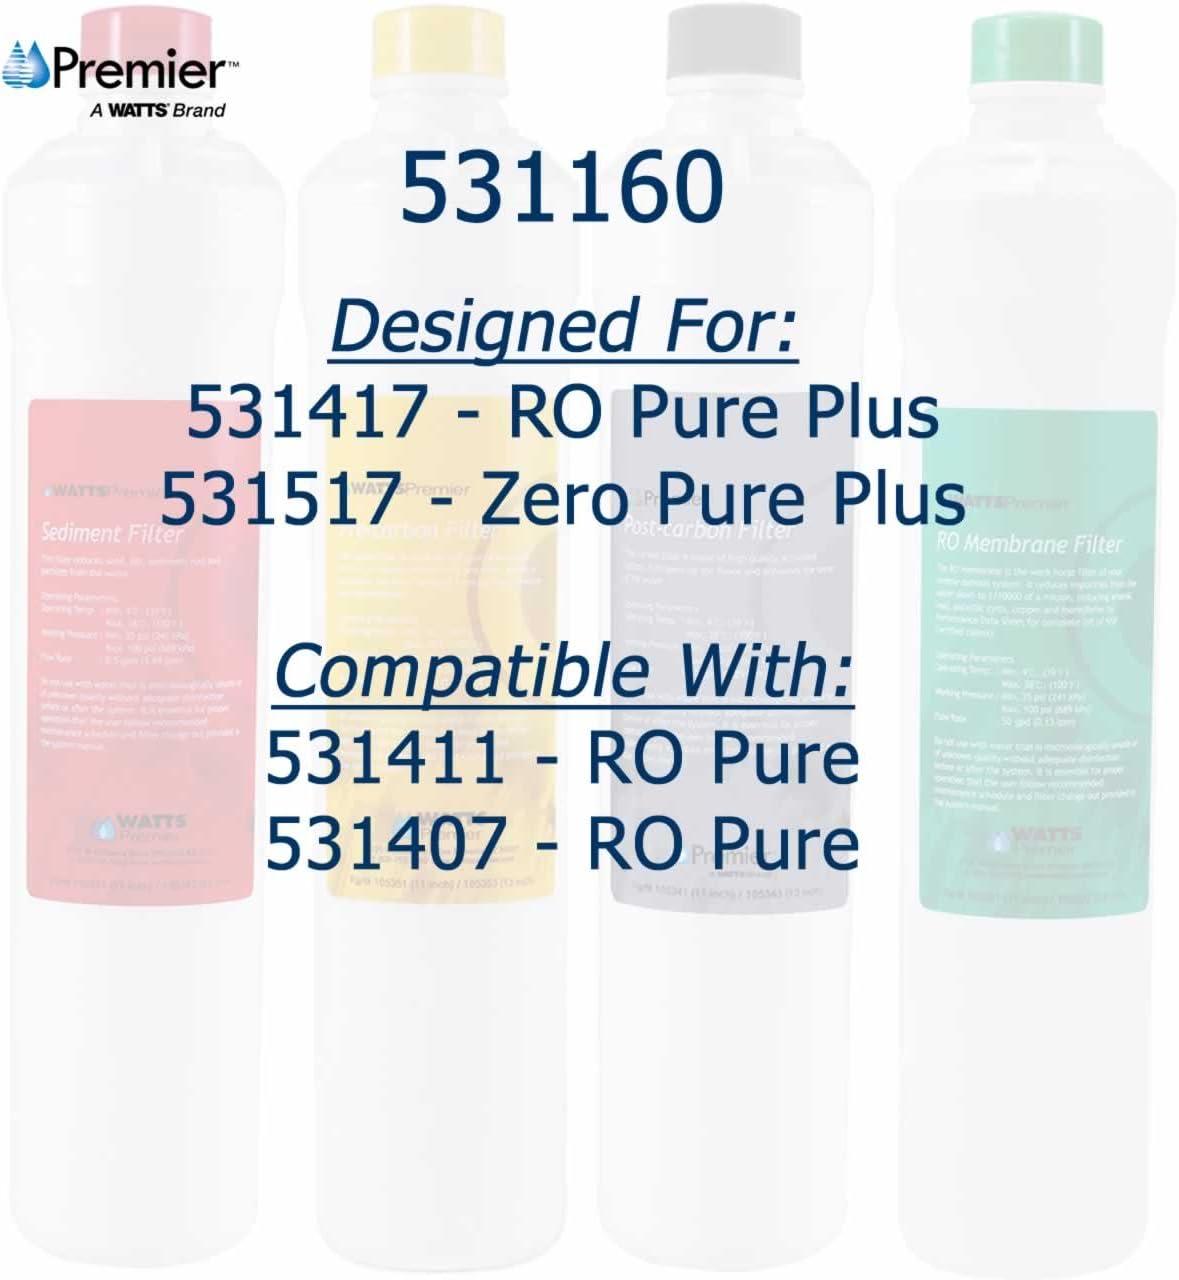 Watts Premier 531160 RO Pure Plus 4 Pack Filter Kit